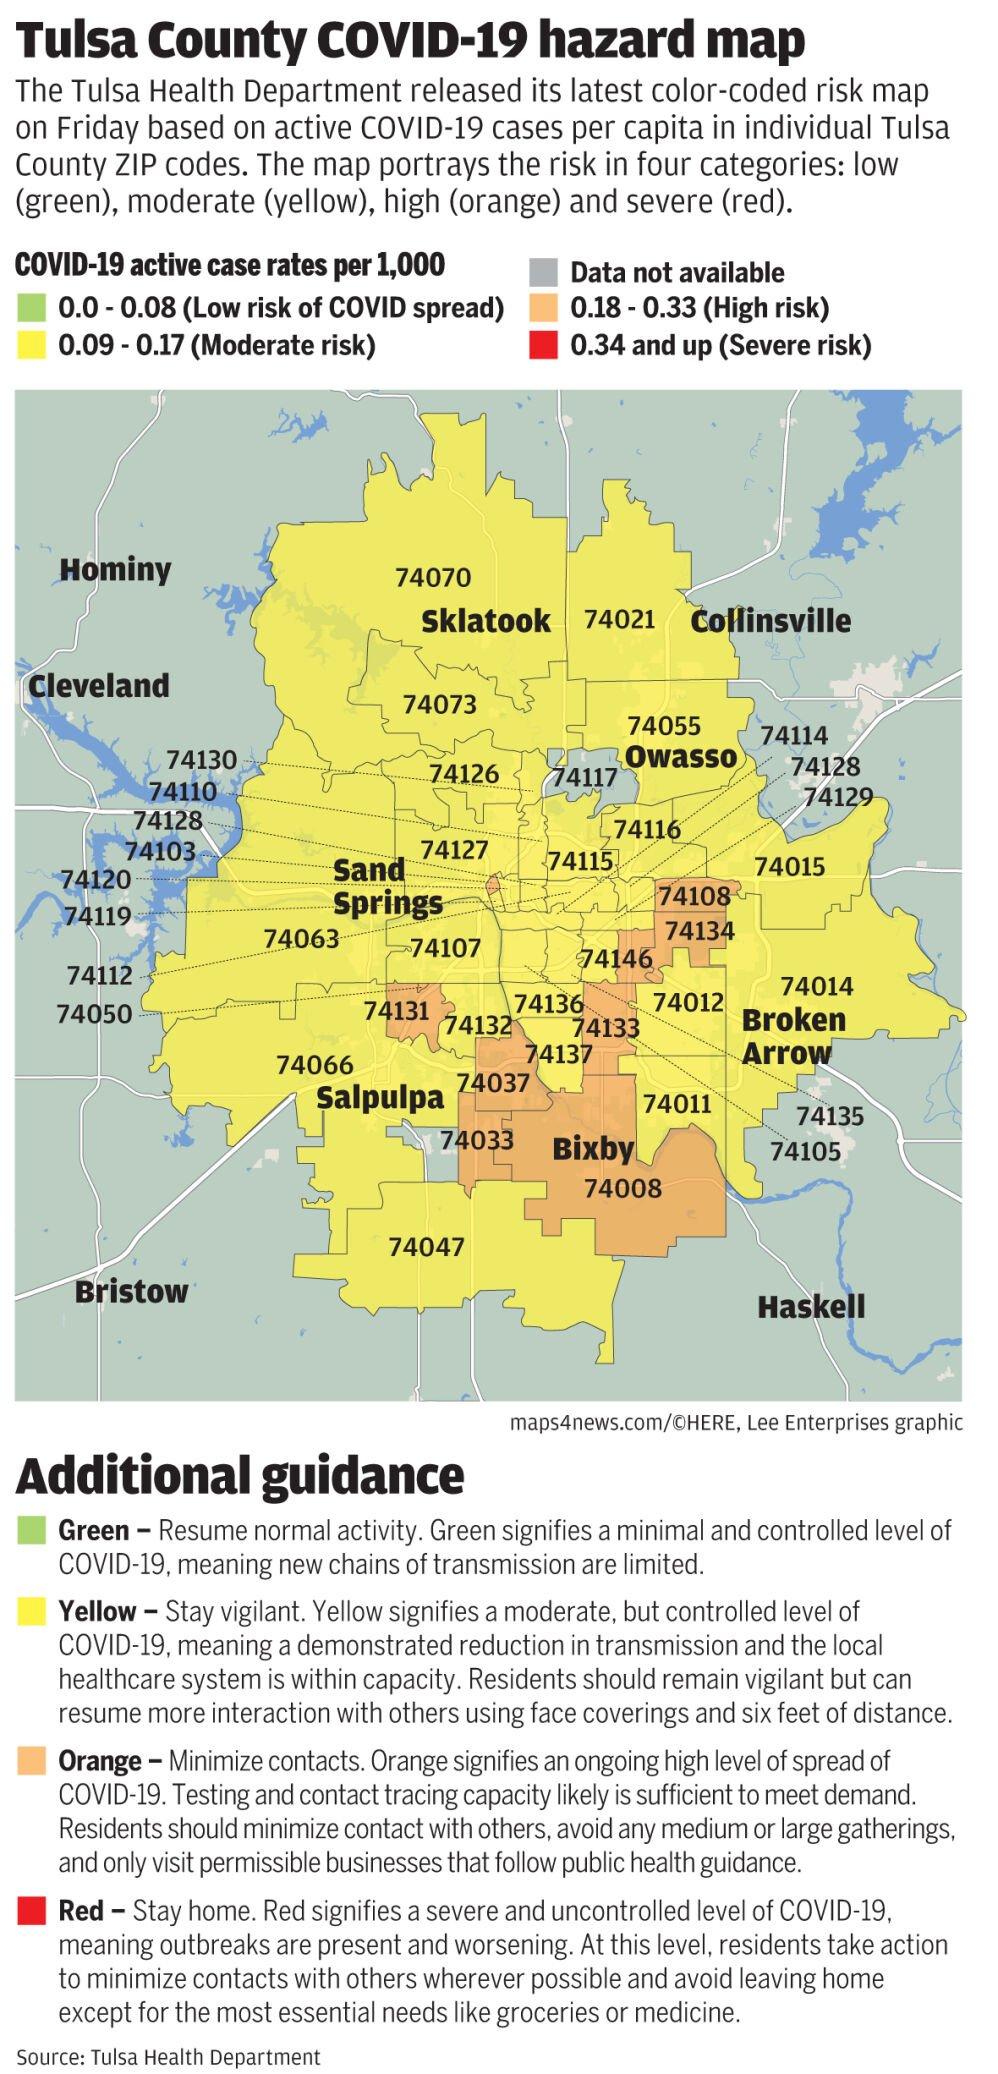 #6079_100620_Tulsa County COVID-19 hazard map copy